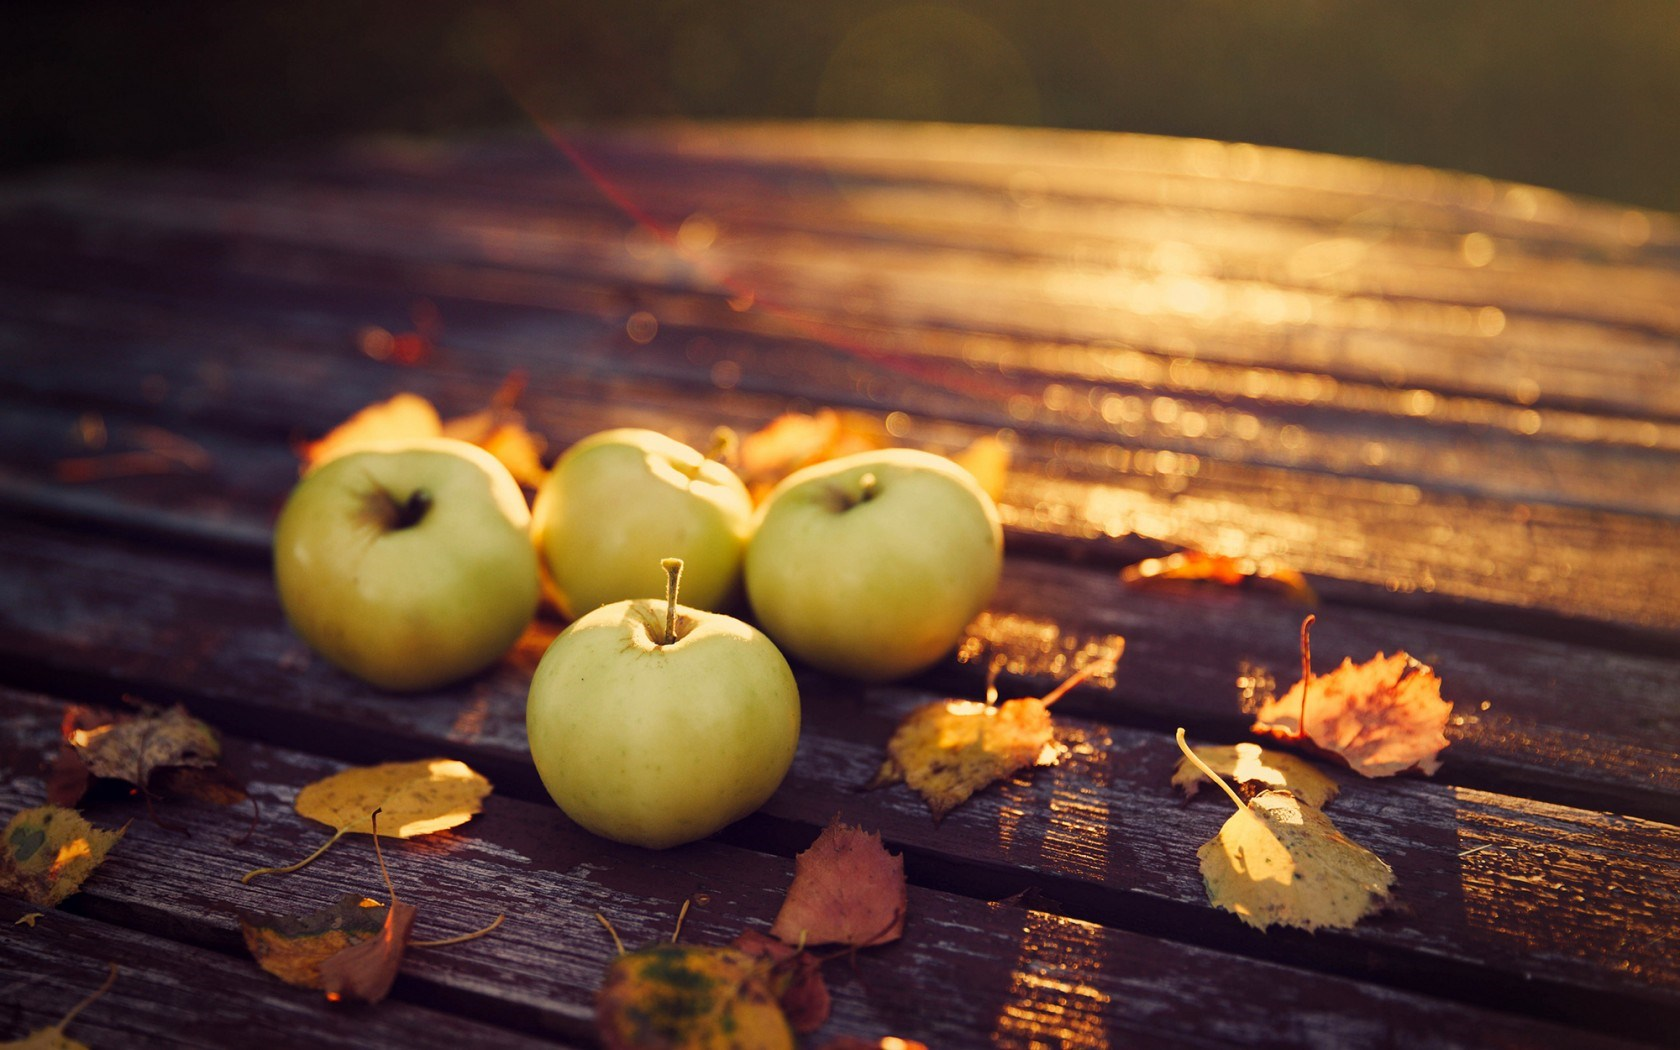 autumn apples wallpaper